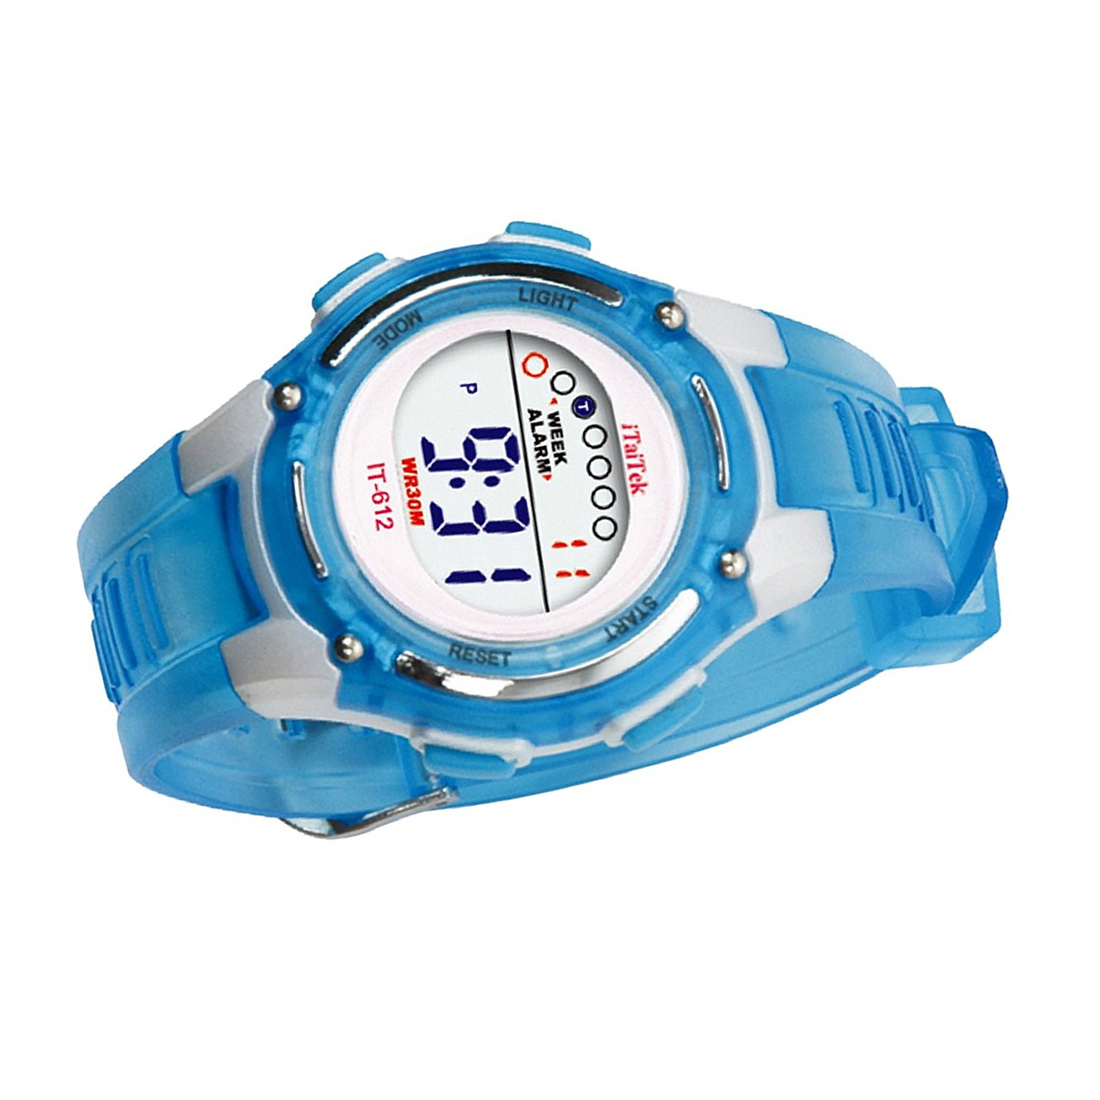 ITaiTek Kids Swimming Digital Sports Waterproof Wrist Watch (Green)